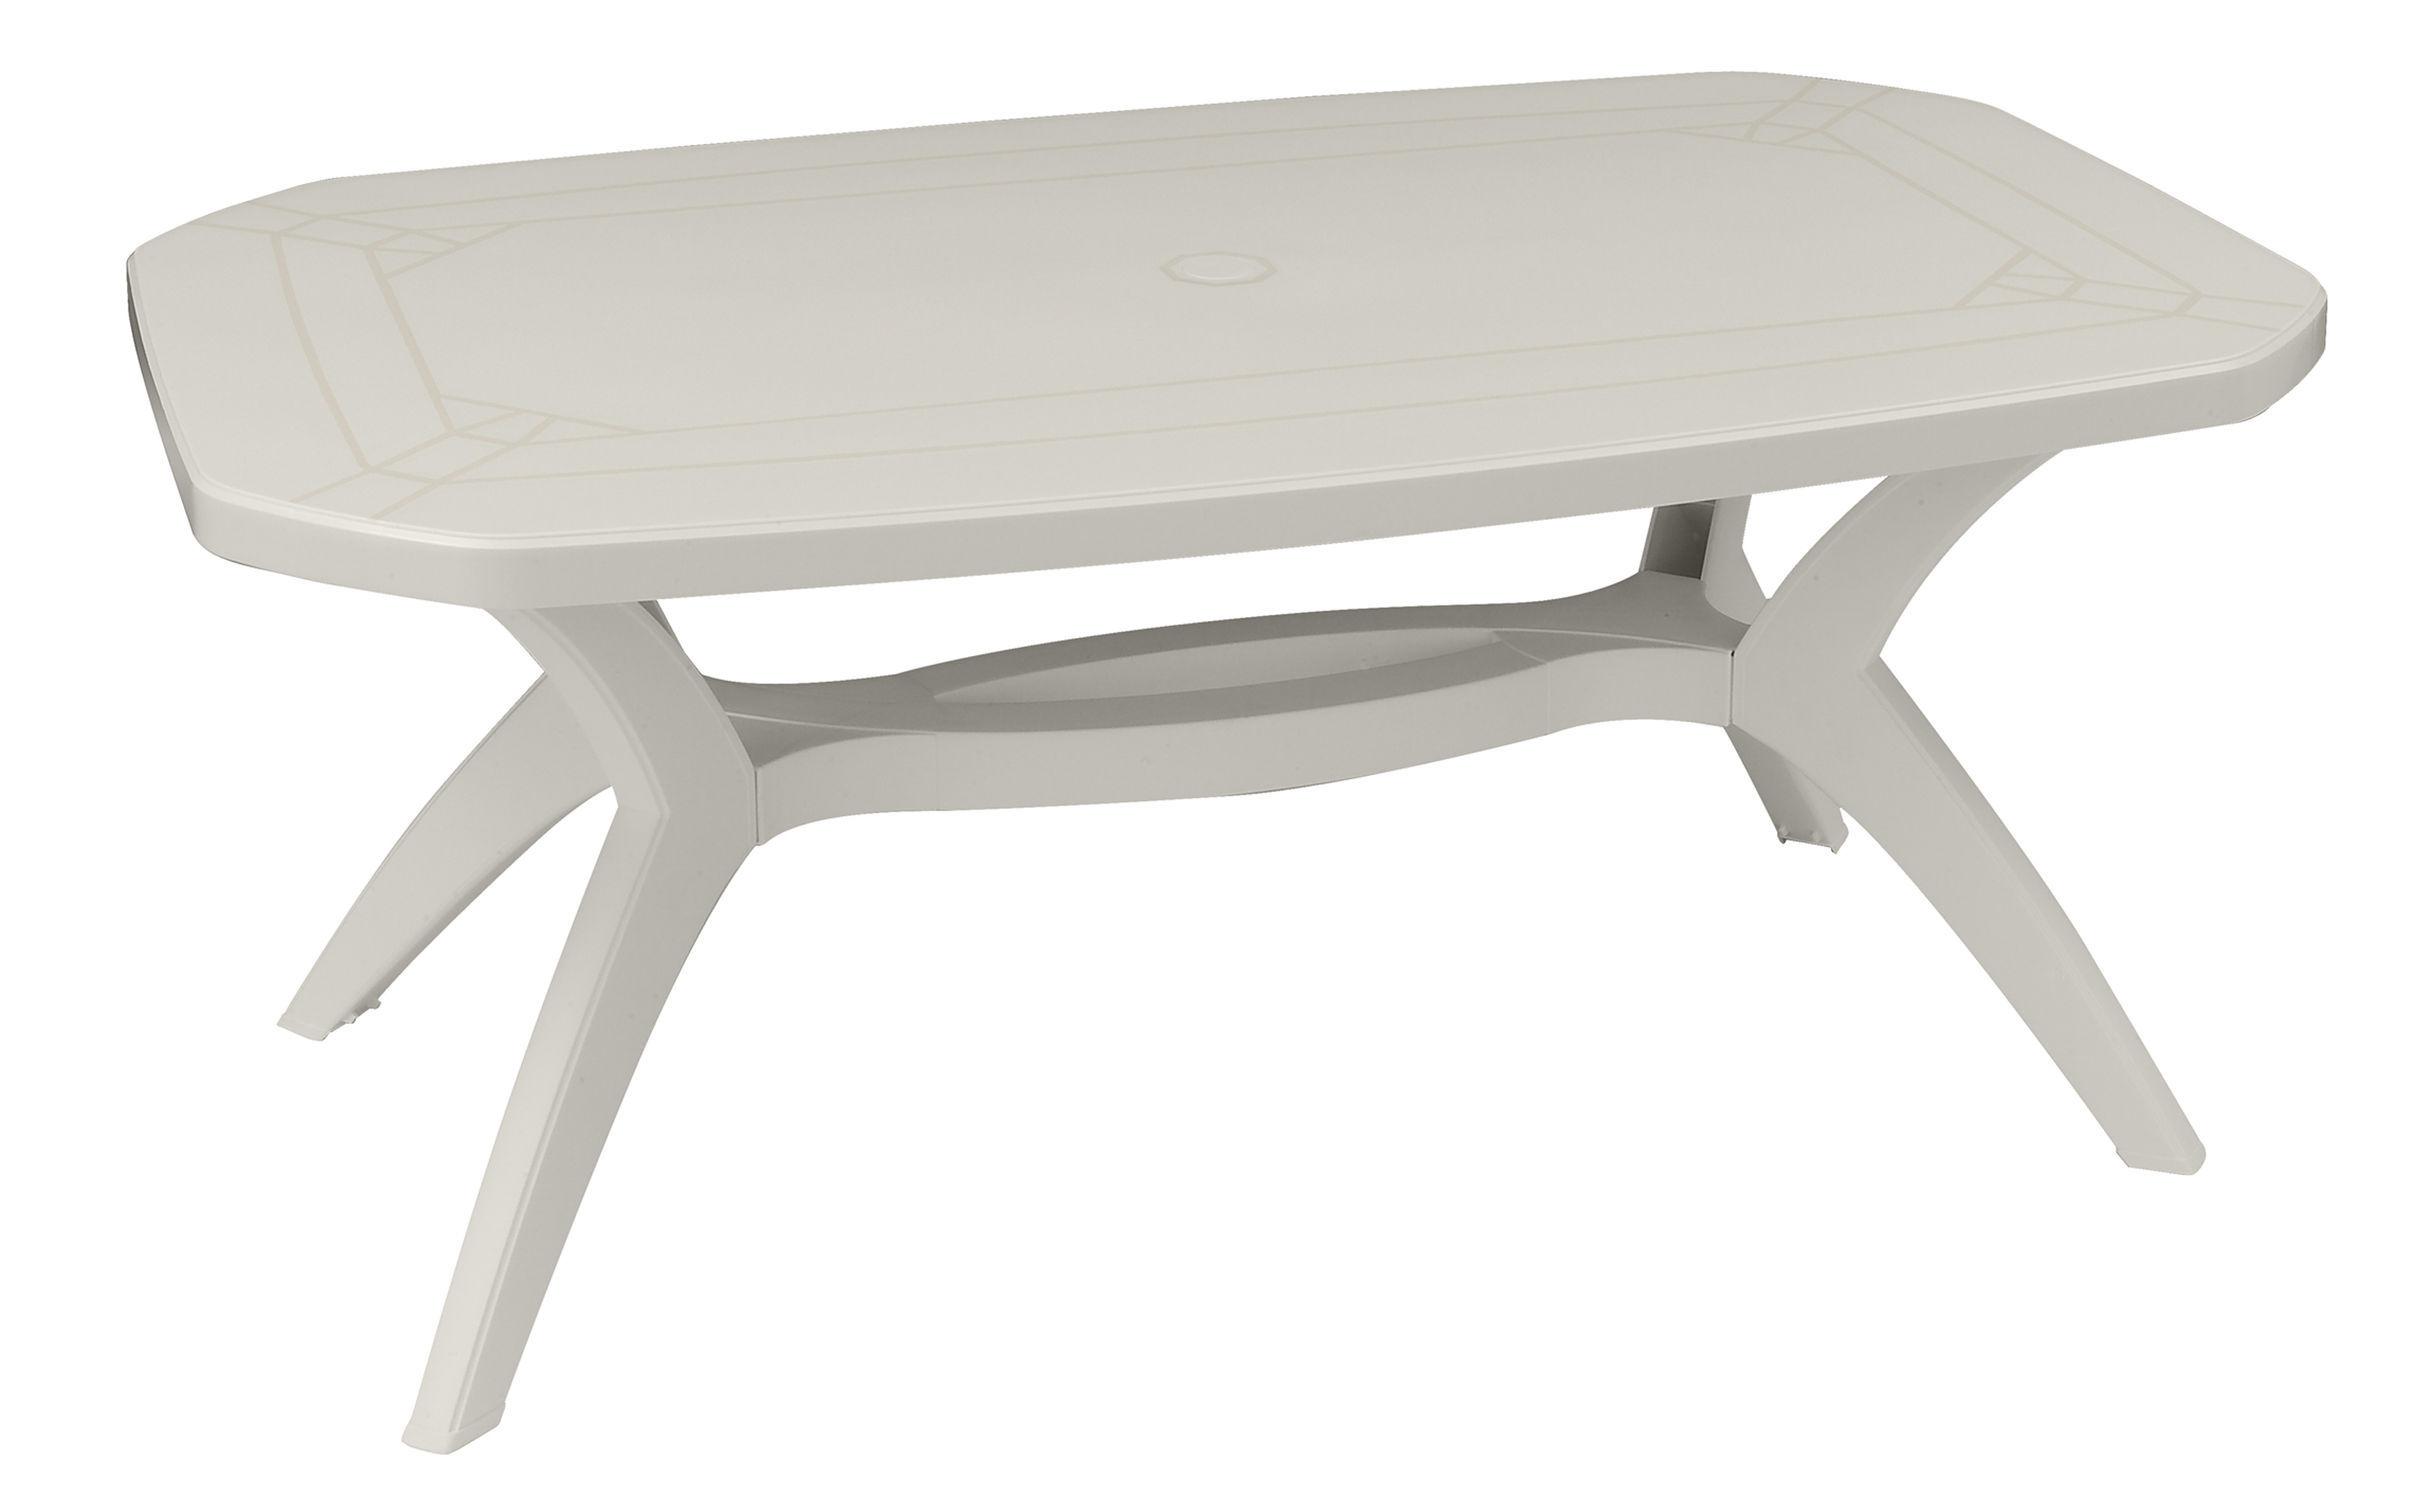 Tavoli Da Giardino Bistrot: Arredo per esterni tavoli da giardino ...